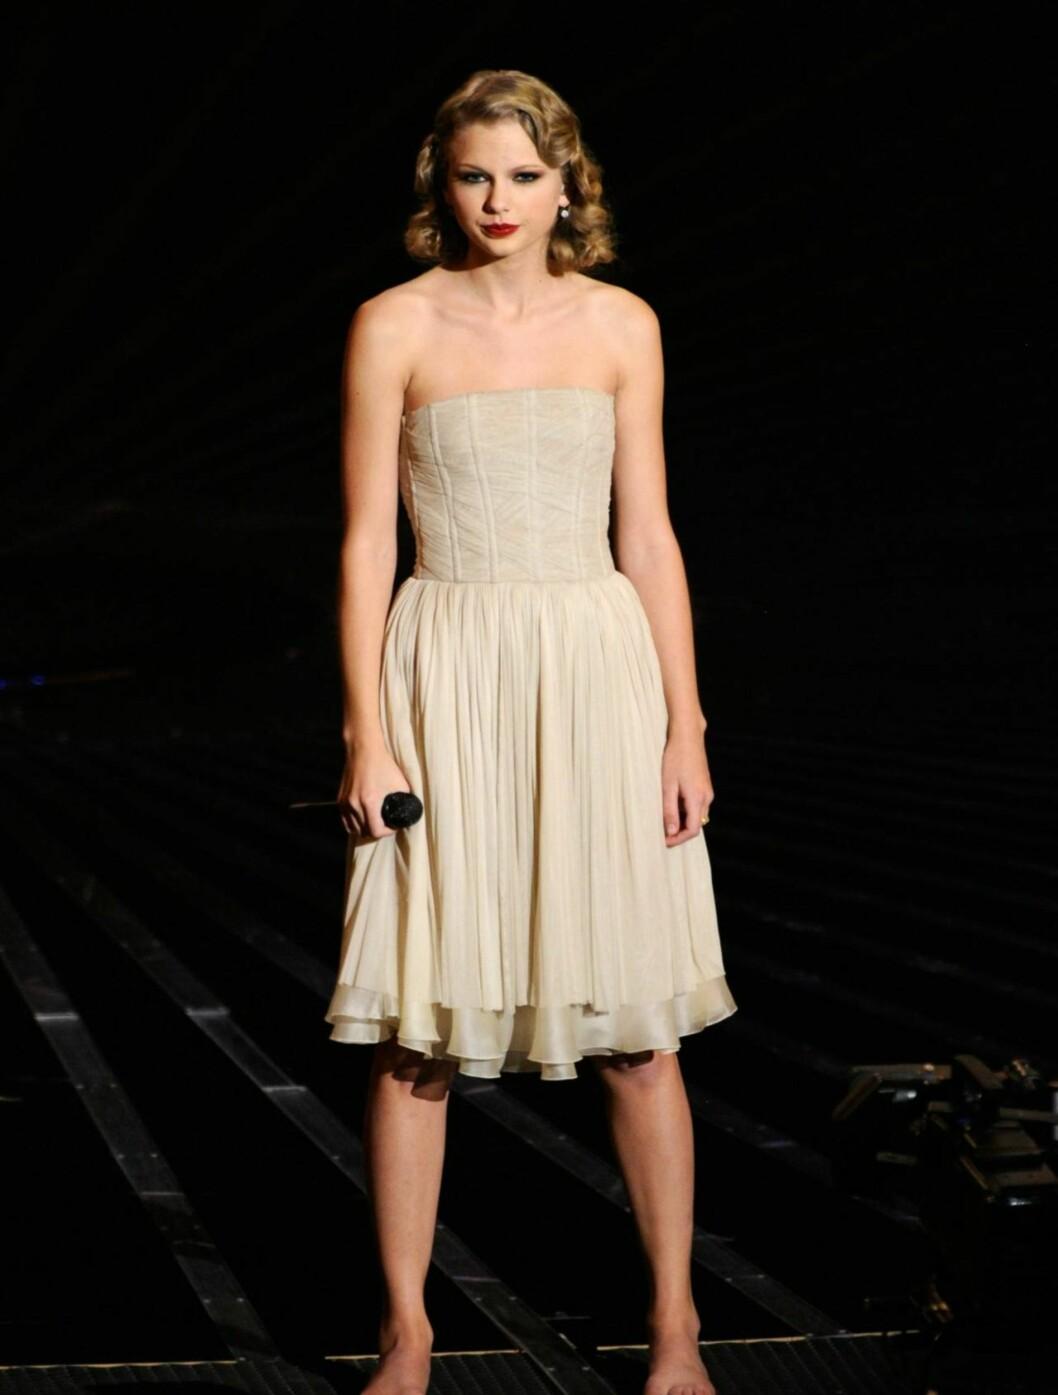 BEST: Popstjernen Taylor Swift så henrivende ut på scenen iført en lekker, elfenbensfarget Dolce & Gabbana-kjole. Foto: All Over Press